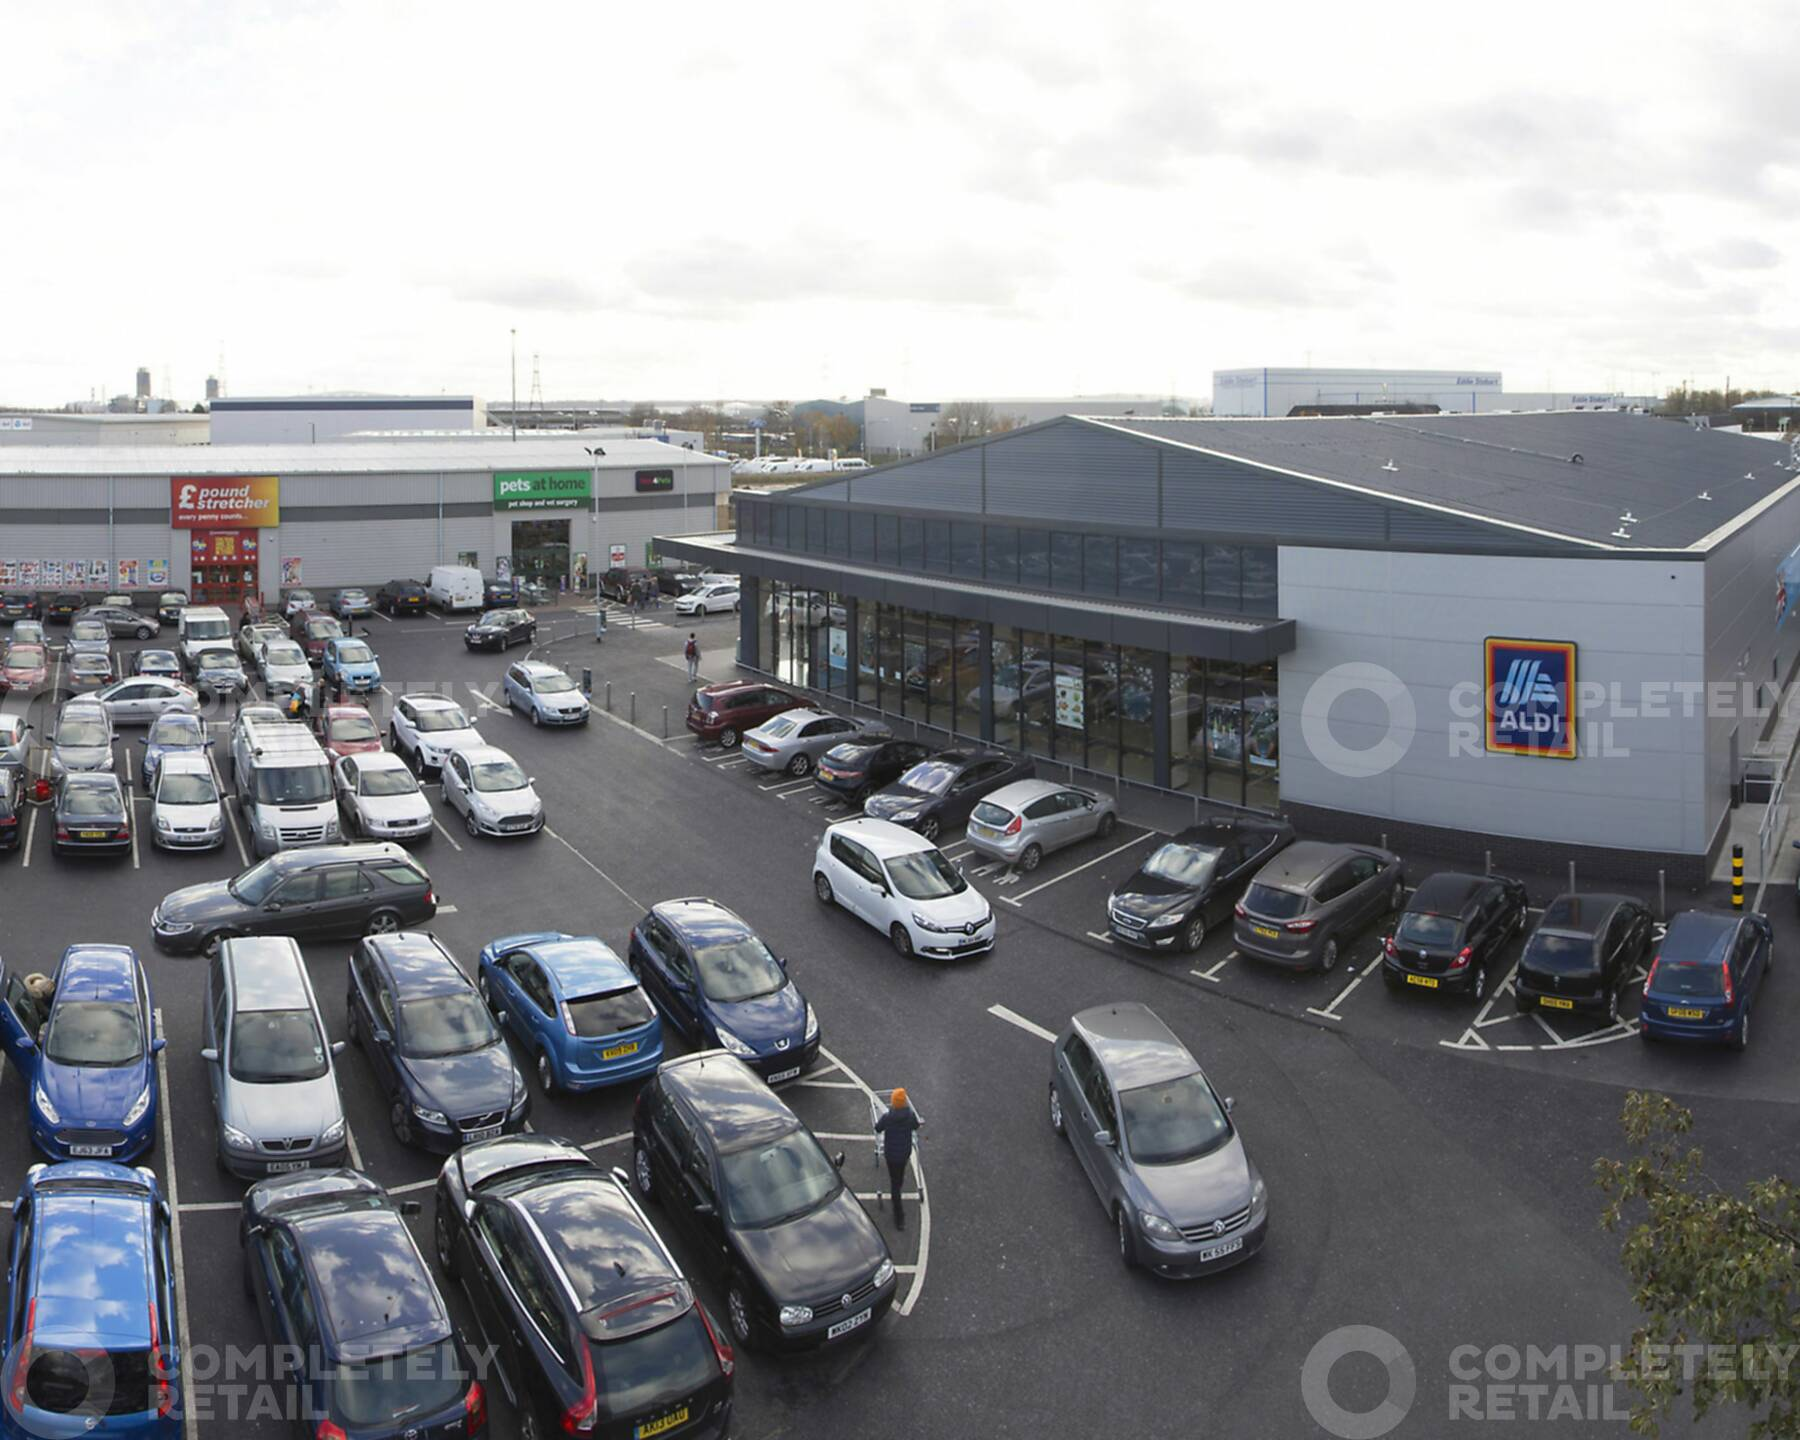 Merrielands Retail Park Dagenham Completely Retail